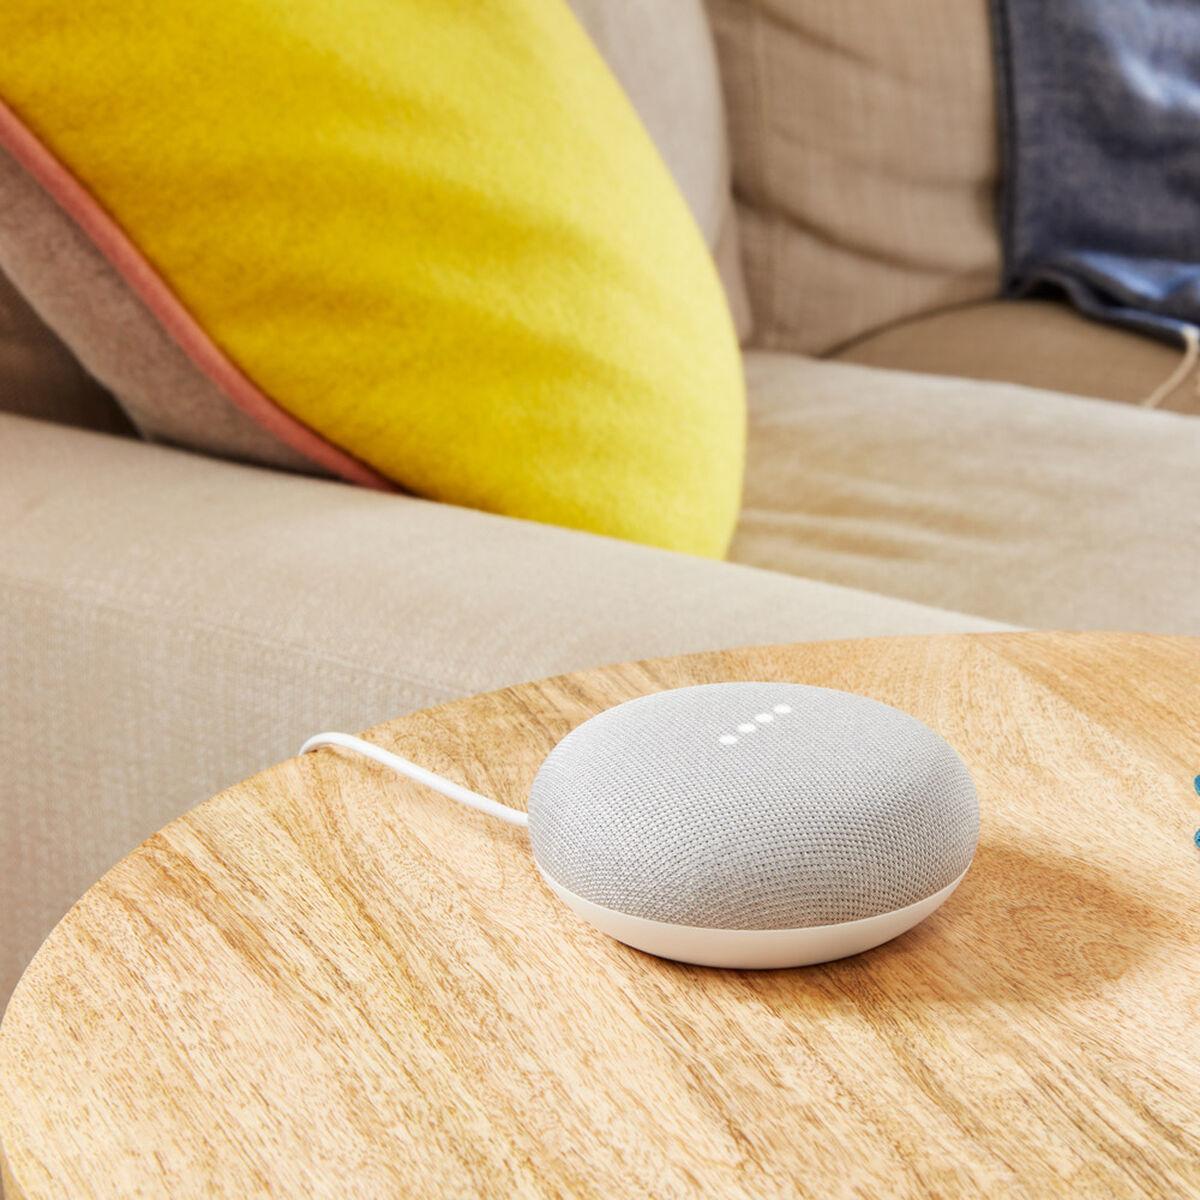 Asistente de Voz en Español Google Home Mini Gris